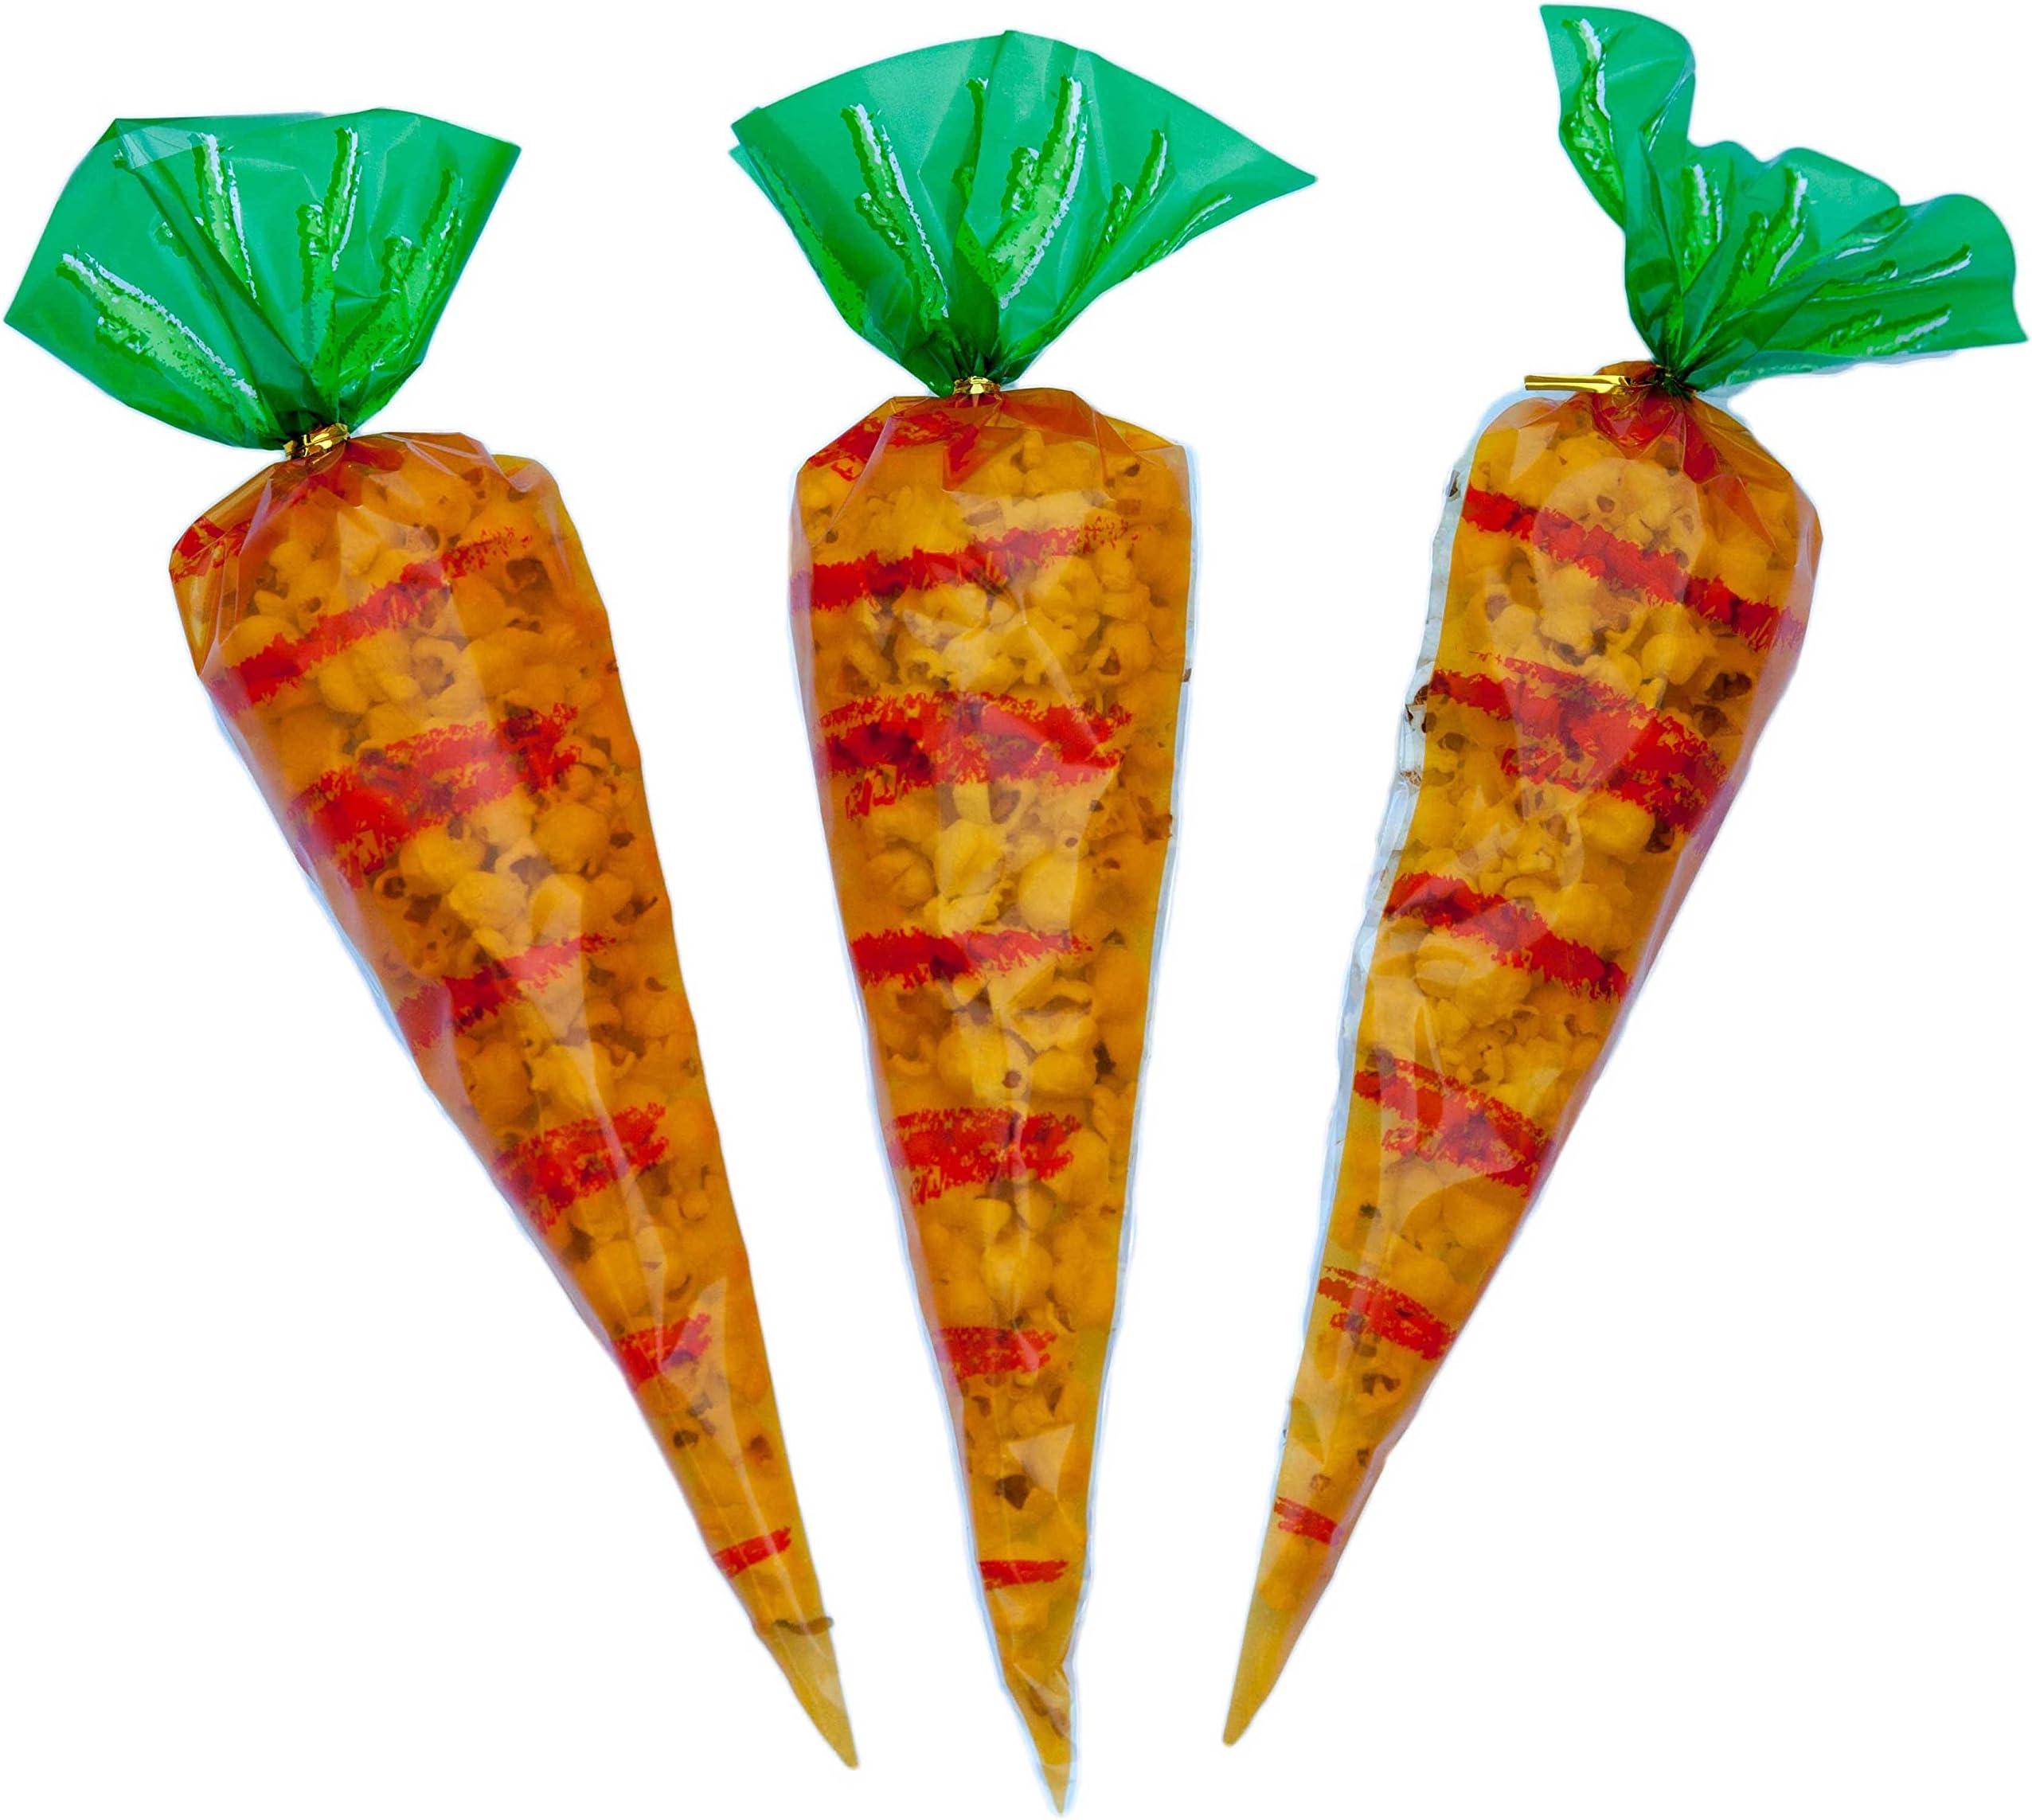 PUL Lined Bag Sugar City Collection Purple Carrots Carrots Orange Carrots Flat Bottom Pouch w PUL Carrot Bag